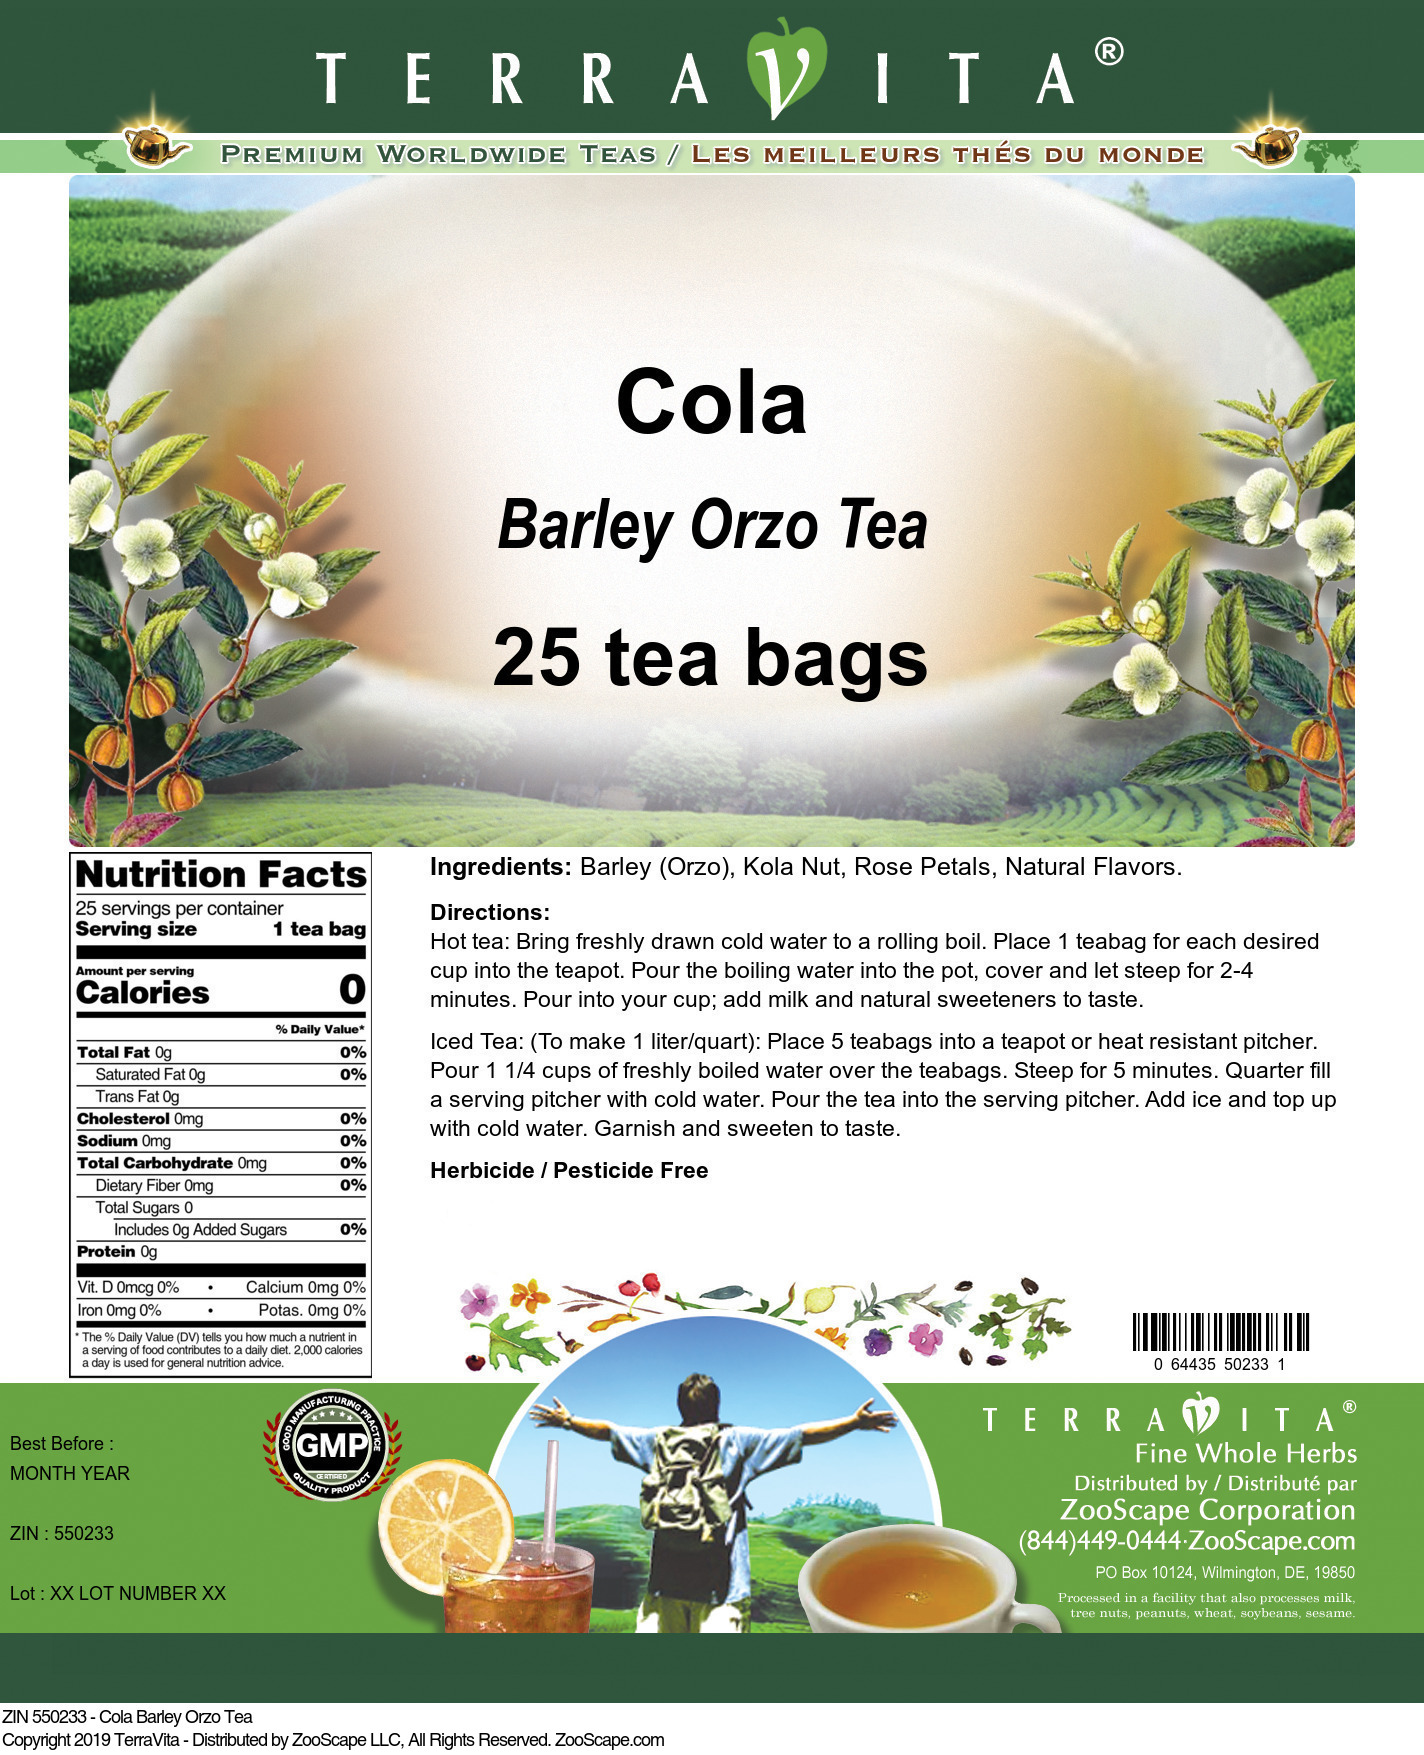 Cola Barley Orzo Tea